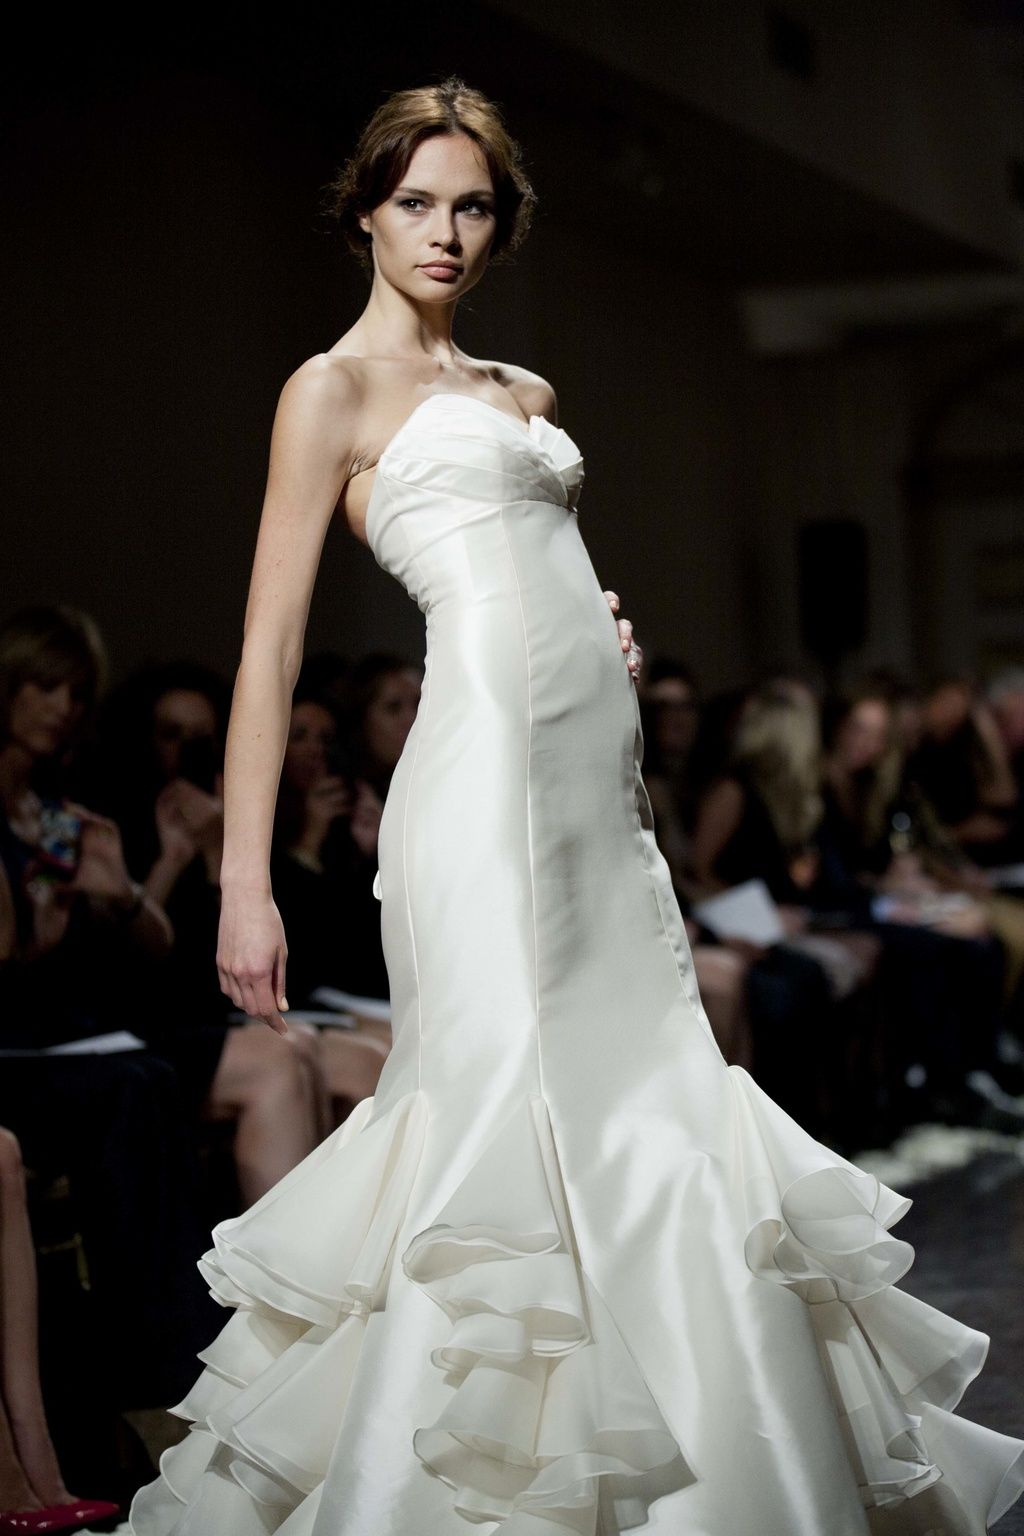 Mermaid ruffle wedding dress  Weddingdresslazarofallbridalgownssleekmermaidruffles